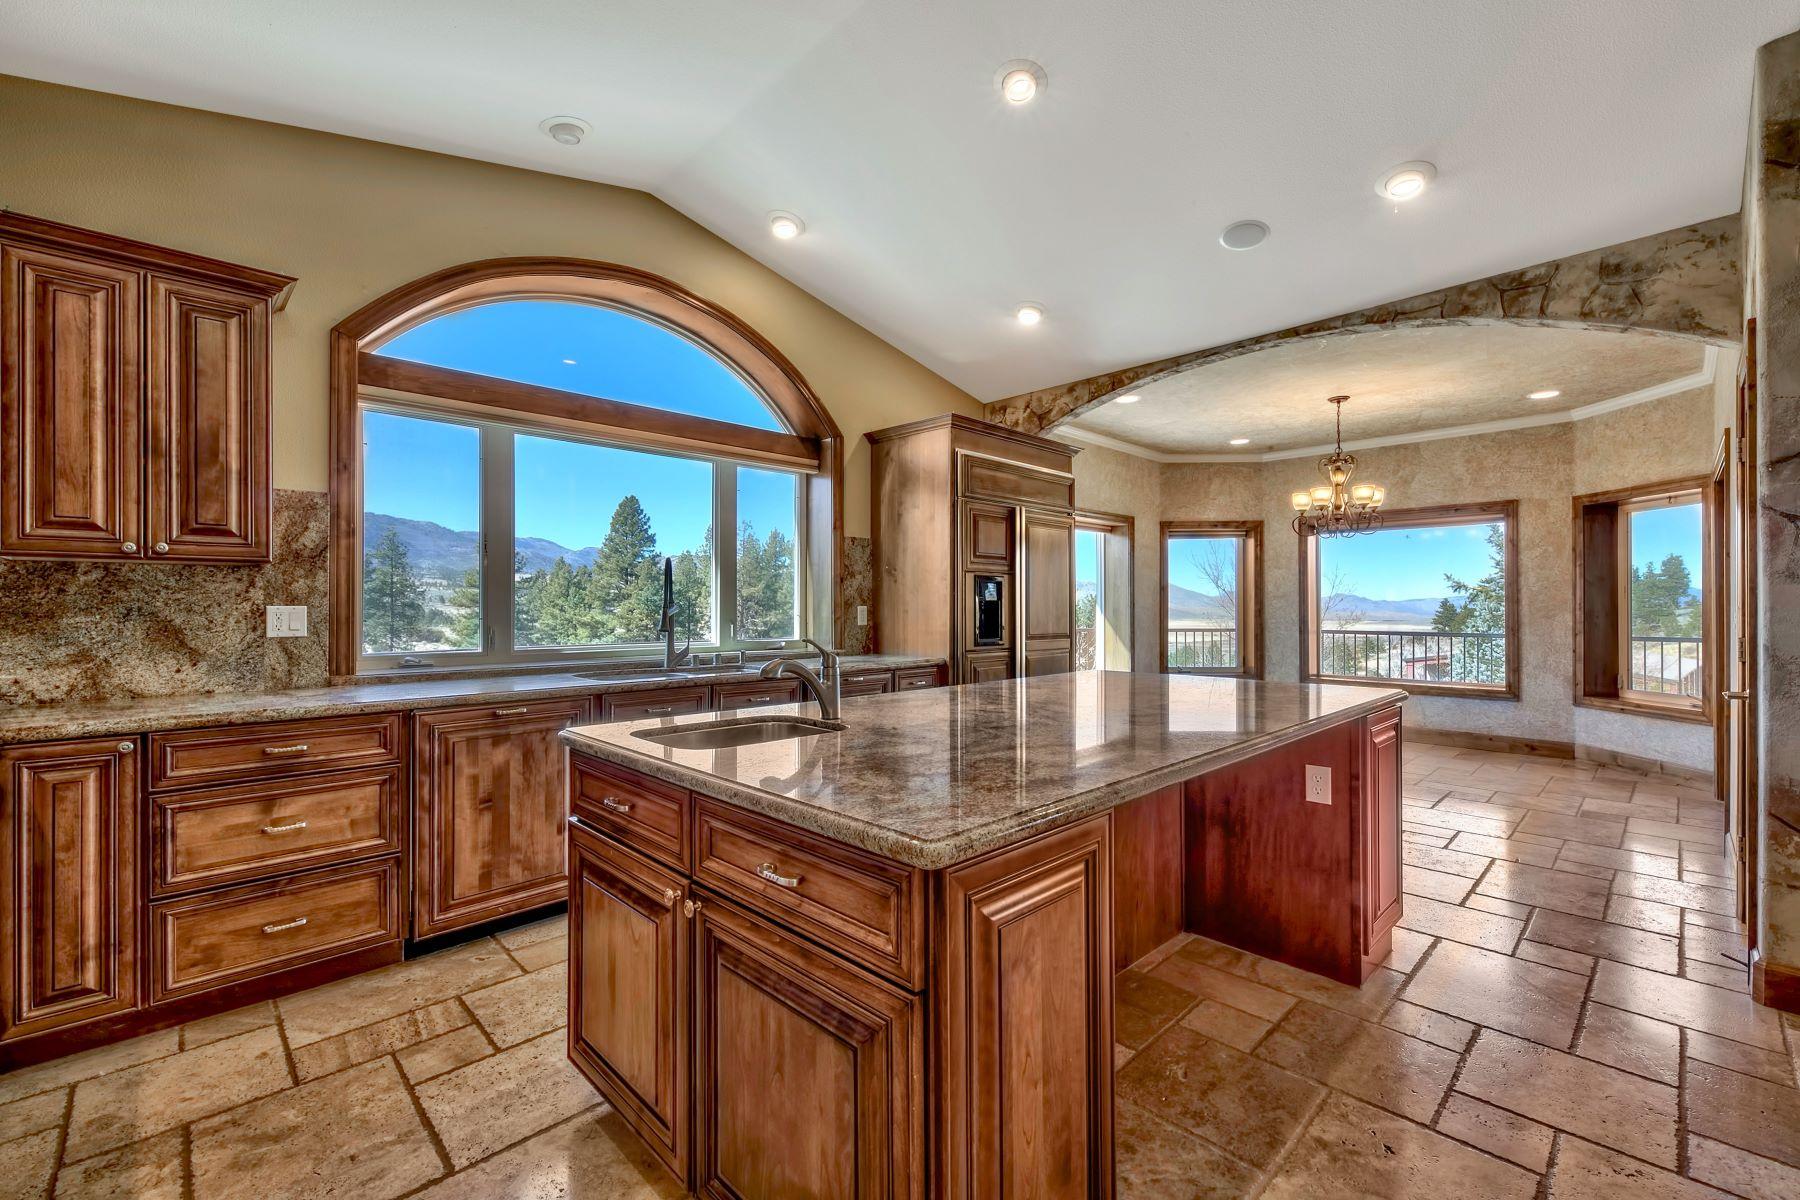 Additional photo for property listing at 14700 Sto Lat Lane, Reno, NV 89506 14700 Sto Lat Lane Reno, Nevada 89506 United States